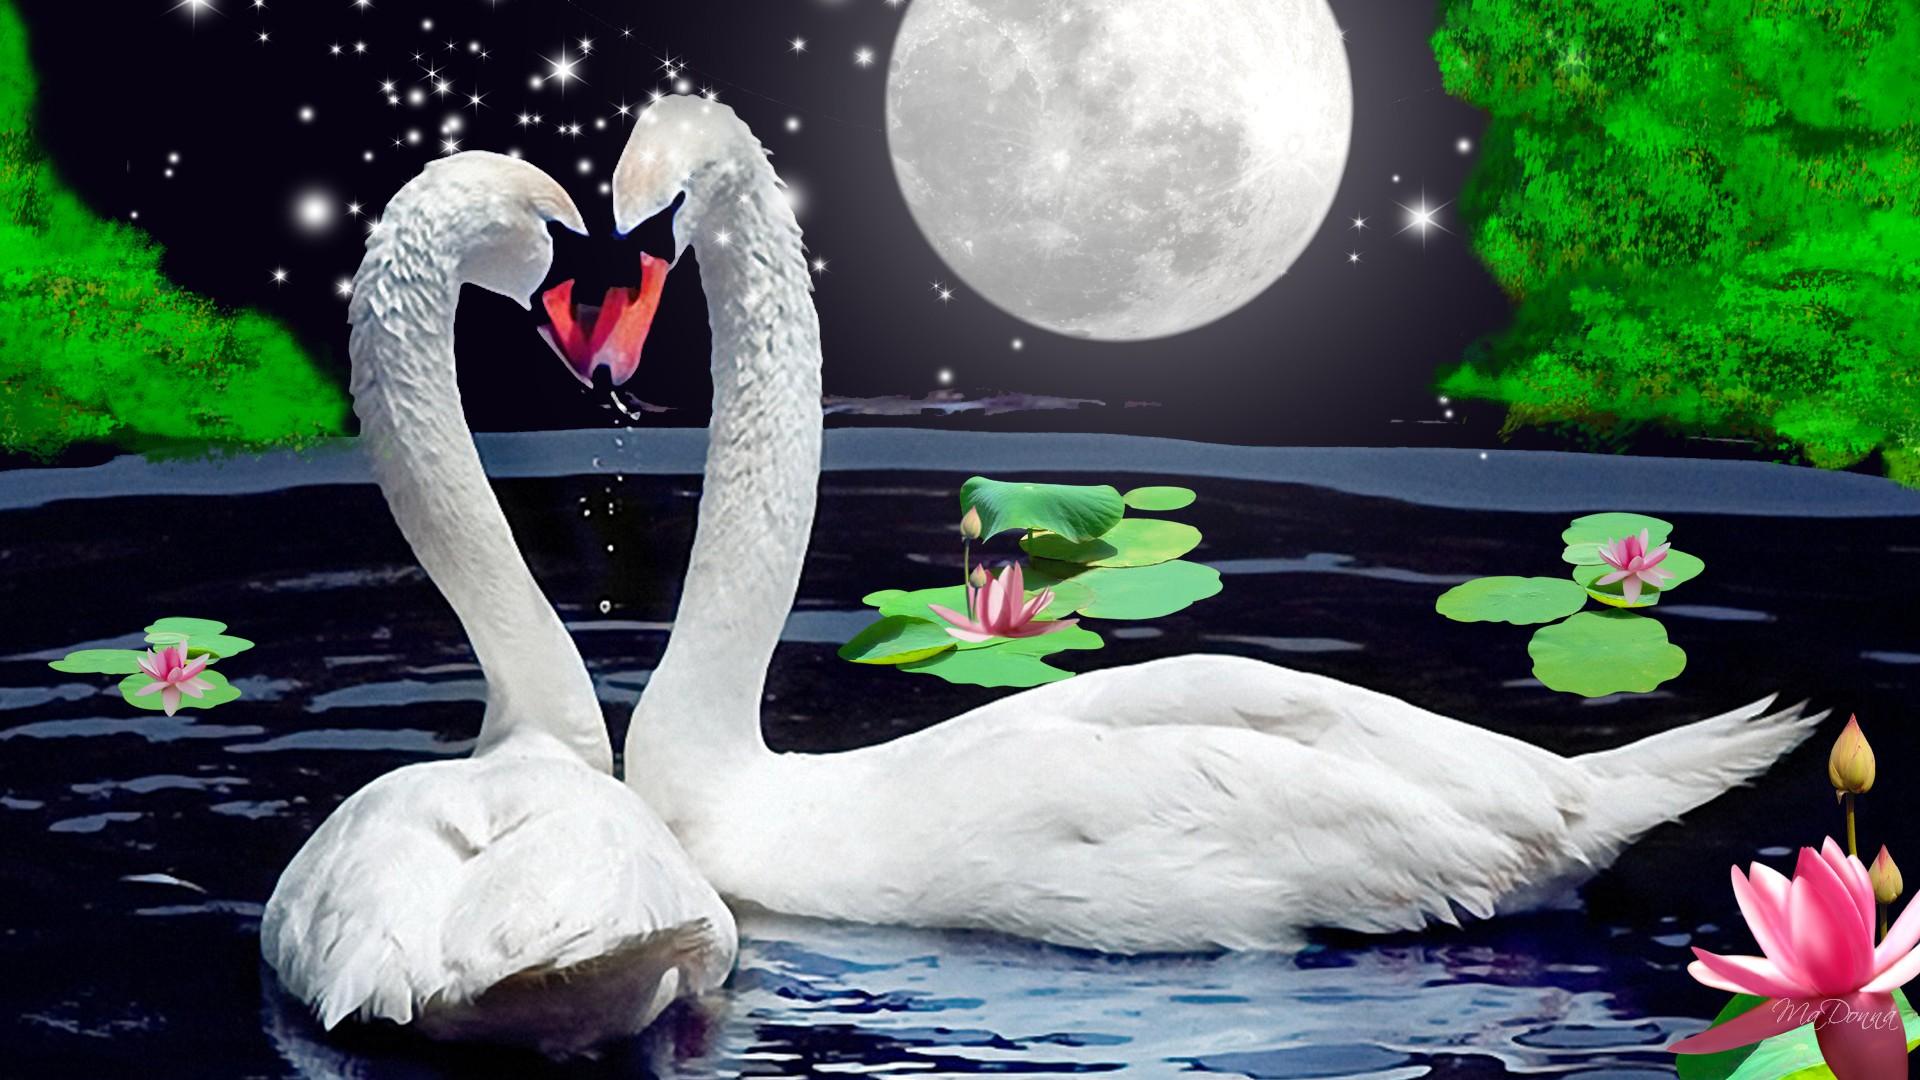 лебедь картинка блестяшками недавнем